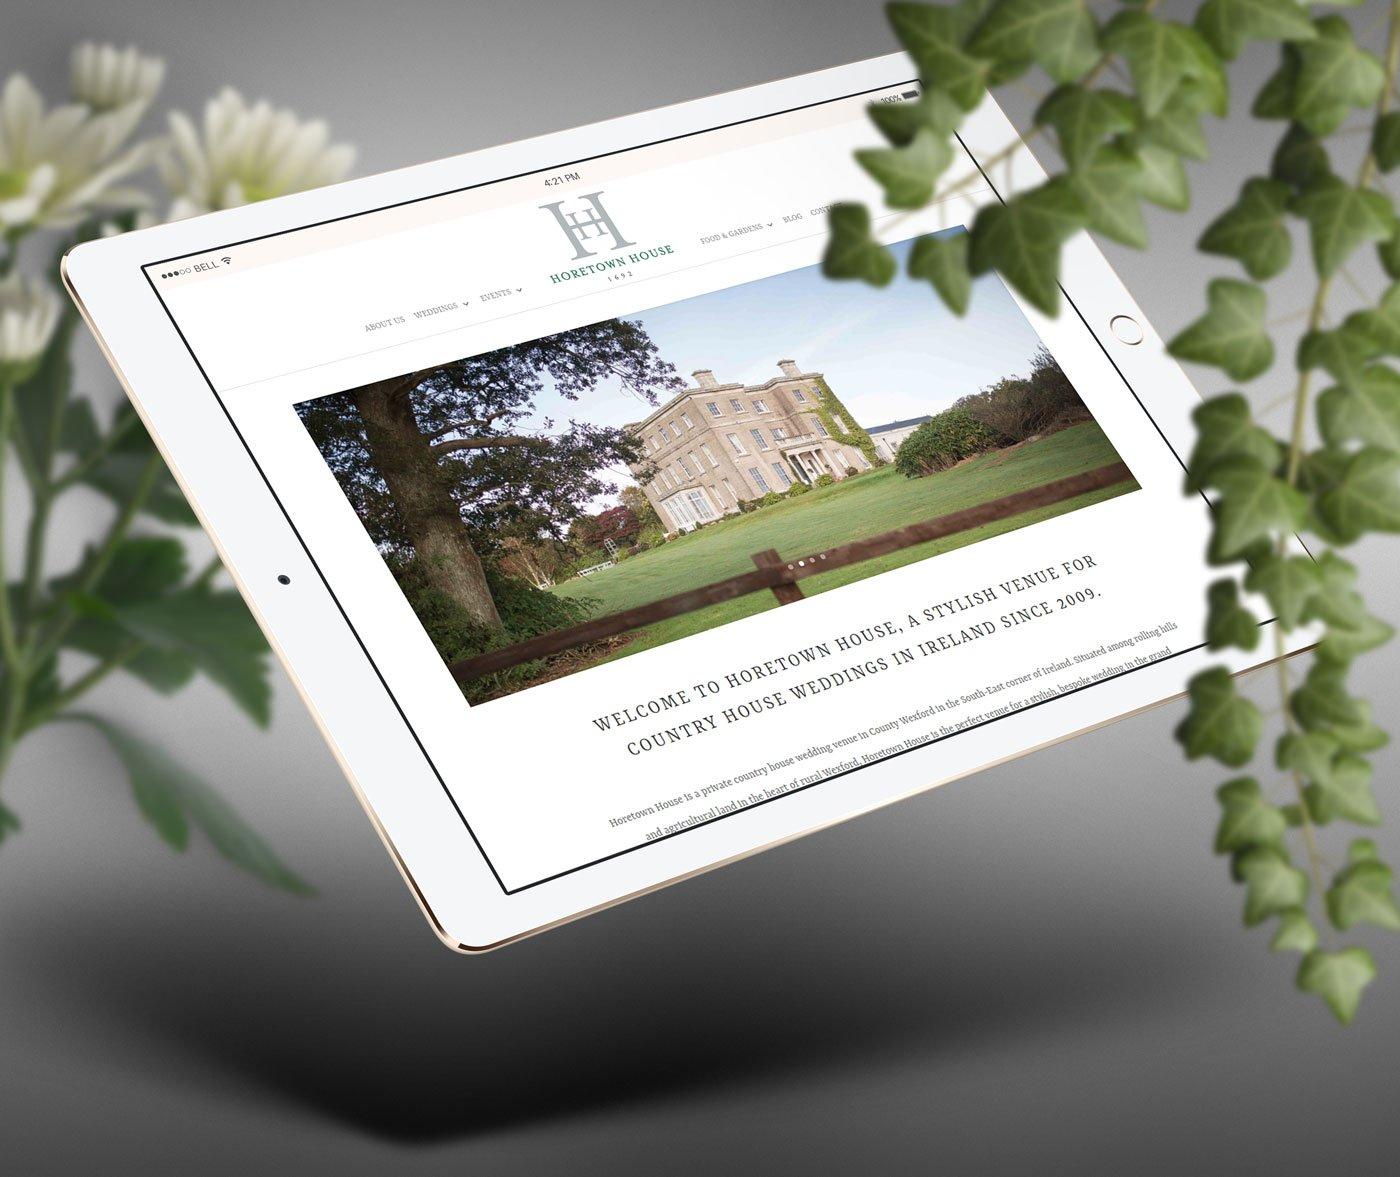 Mobile ready web design. Website design wexford pixelpod.